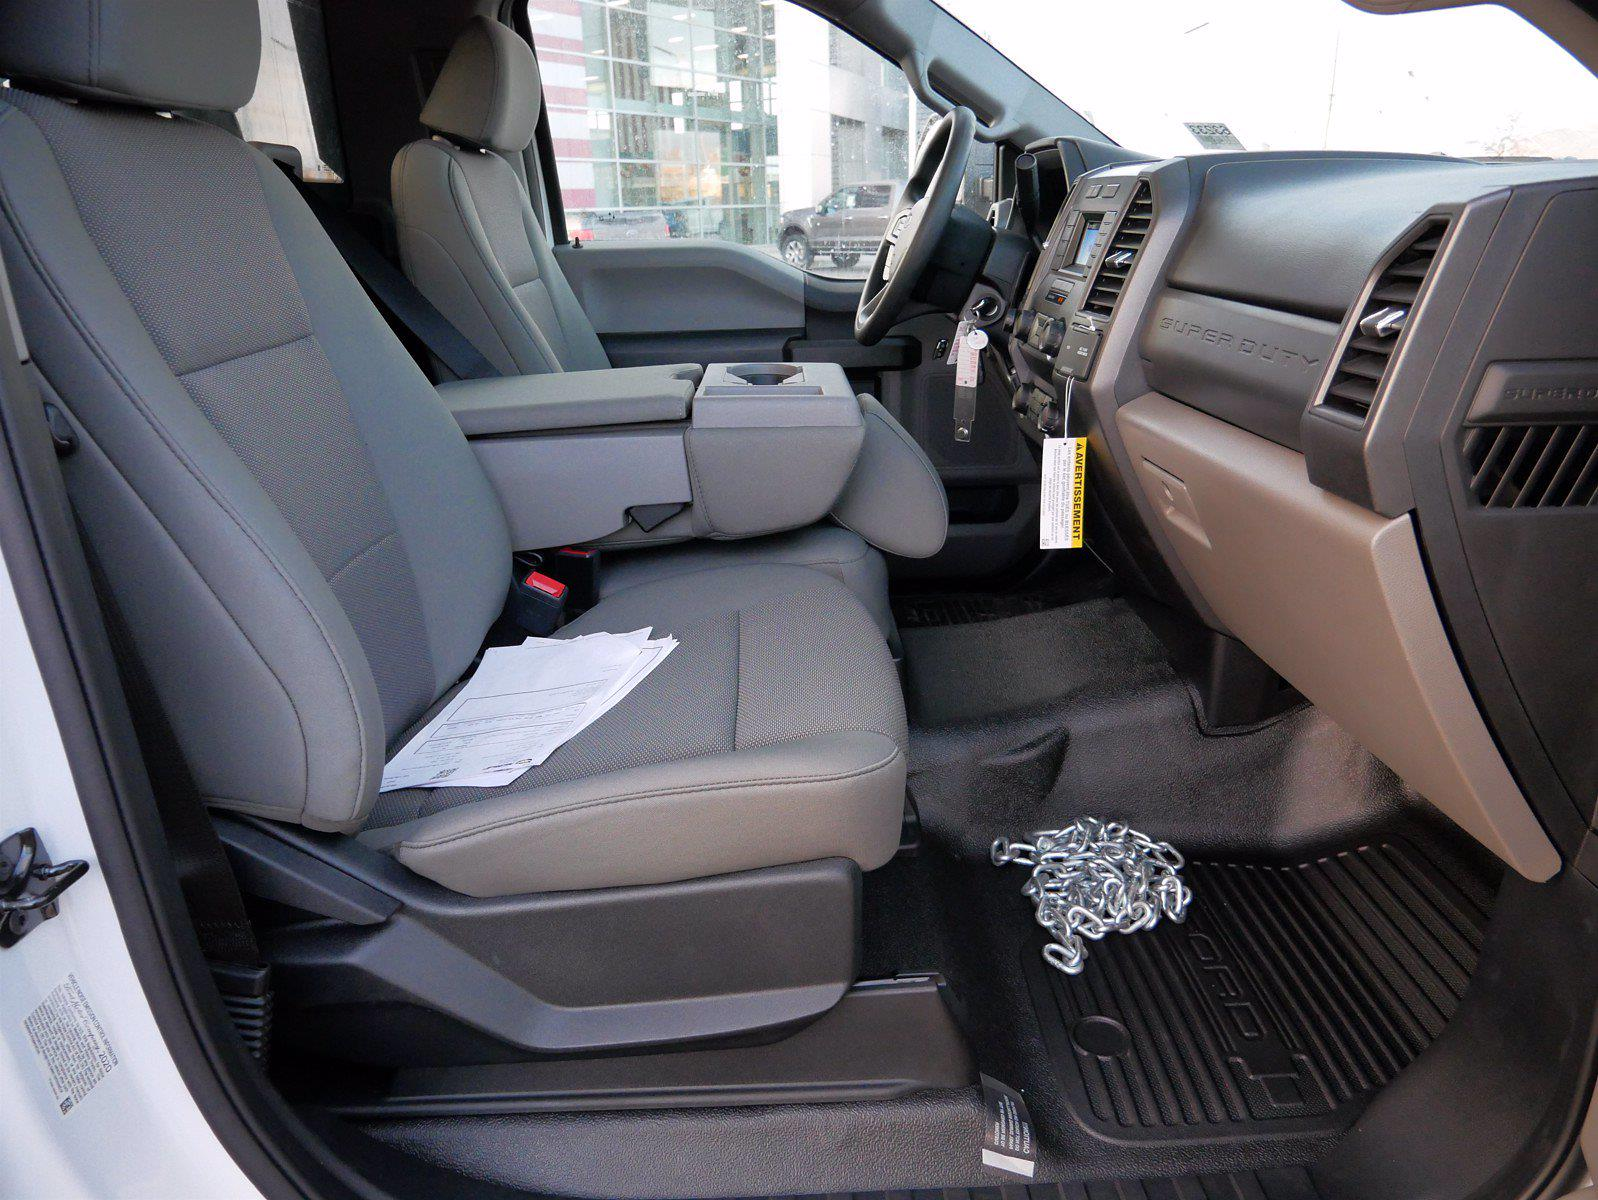 2021 Ford F-550 Regular Cab DRW 4x4, Scelzi Dump Body #64096 - photo 22